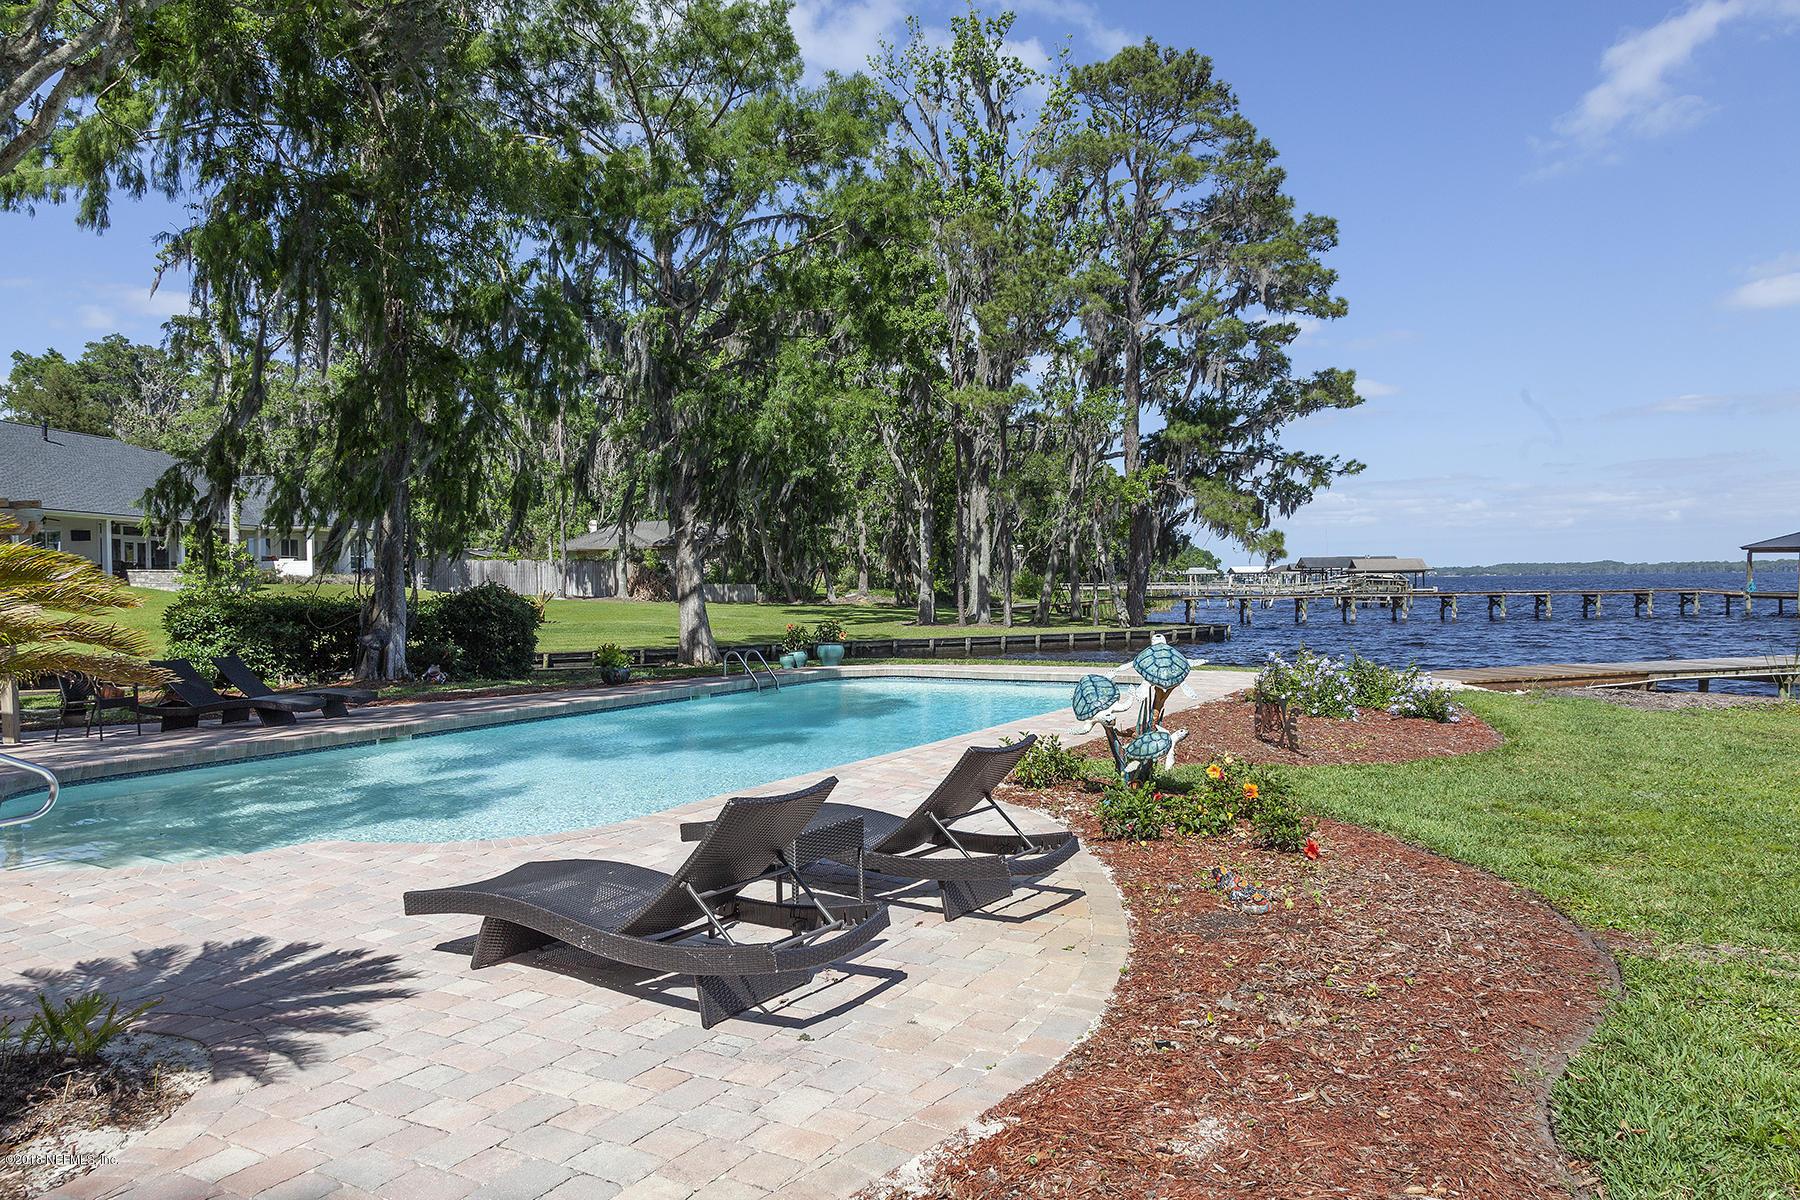 3165 DOCTORS LAKE, ORANGE PARK, FLORIDA 32073, 5 Bedrooms Bedrooms, ,3 BathroomsBathrooms,Residential - single family,For sale,DOCTORS LAKE,937824